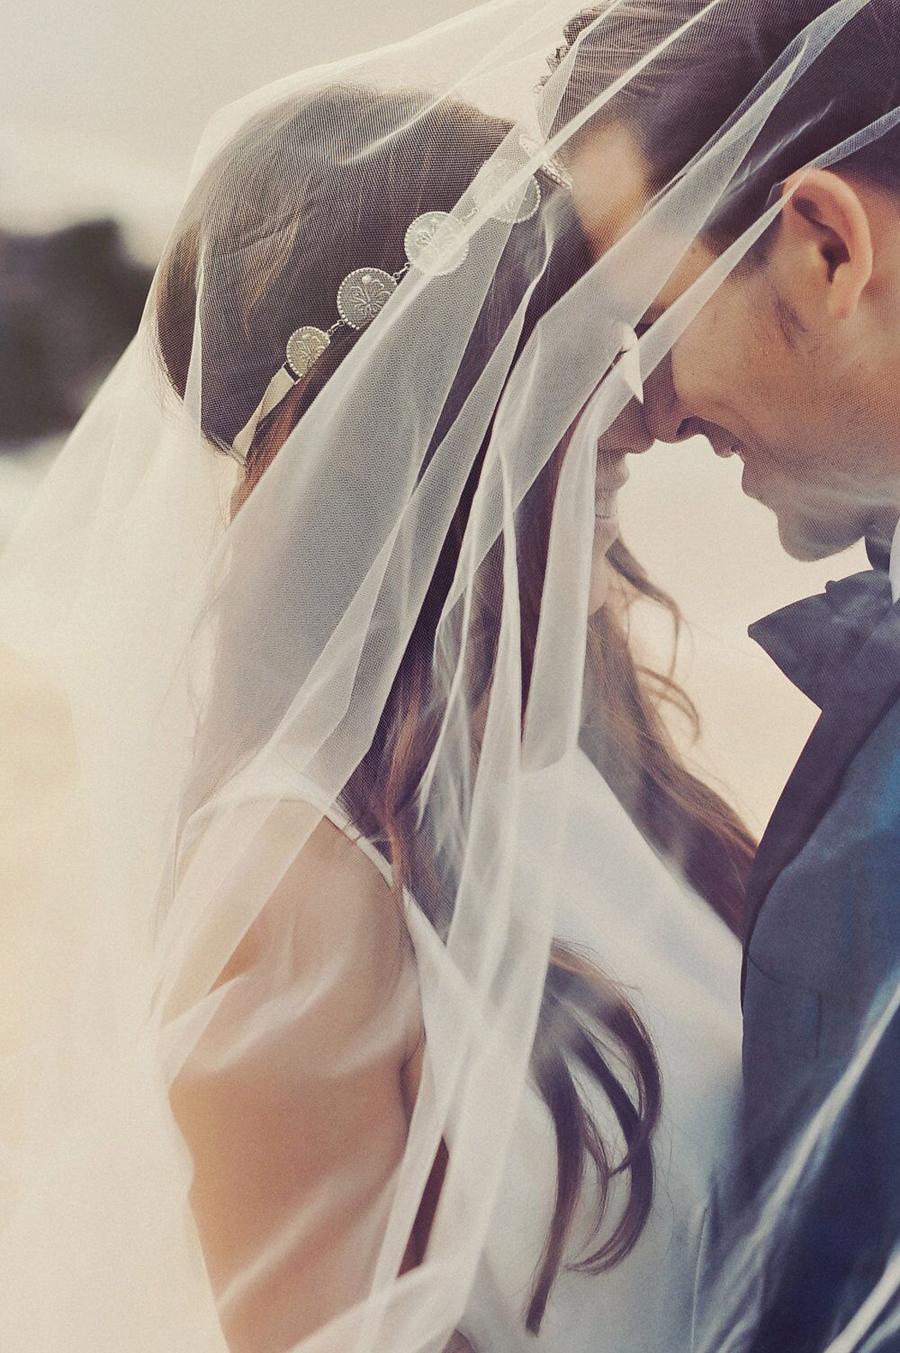 Bride, Groom, Bride and Groom, Wedding, Wedding Day